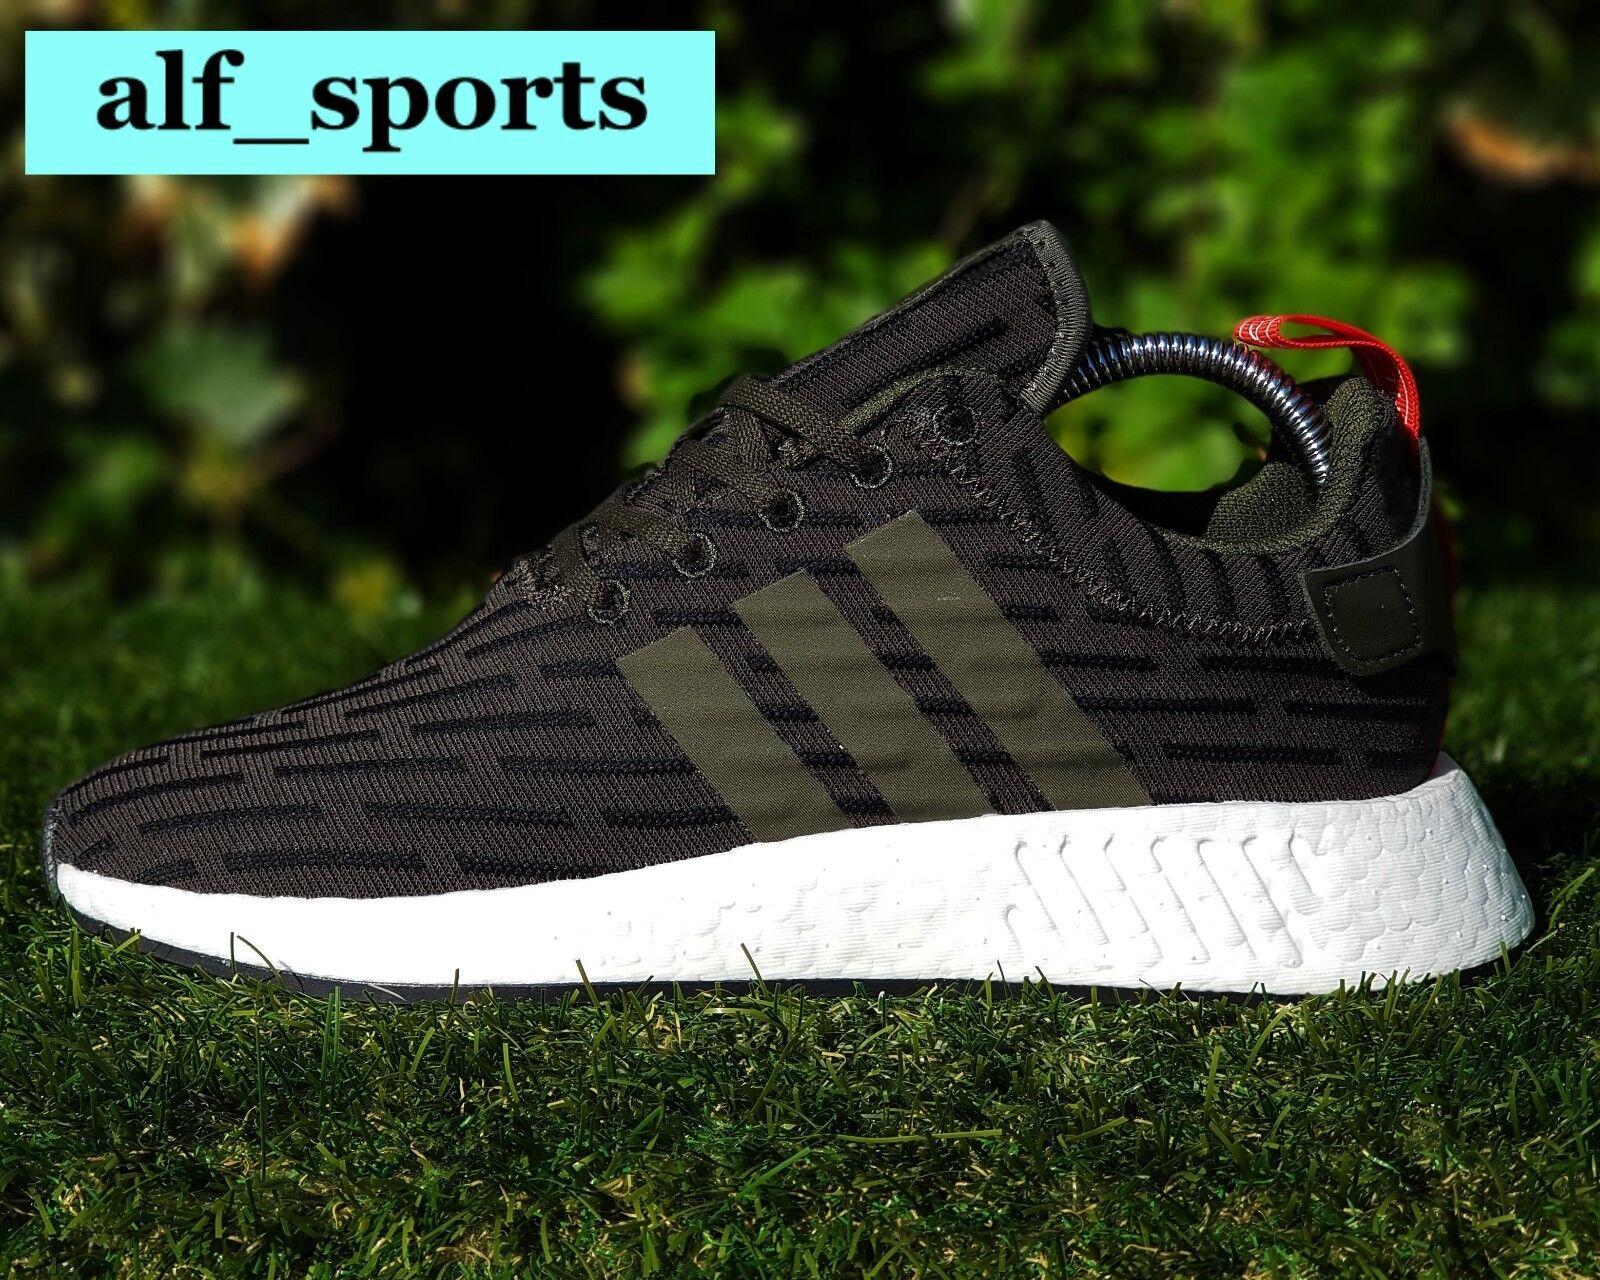 BNWB & Genuine Adidas Originals ® NMD NMD NMD R2 PK Primeknit Khaki Trainers UK Size 9.5 0789e9